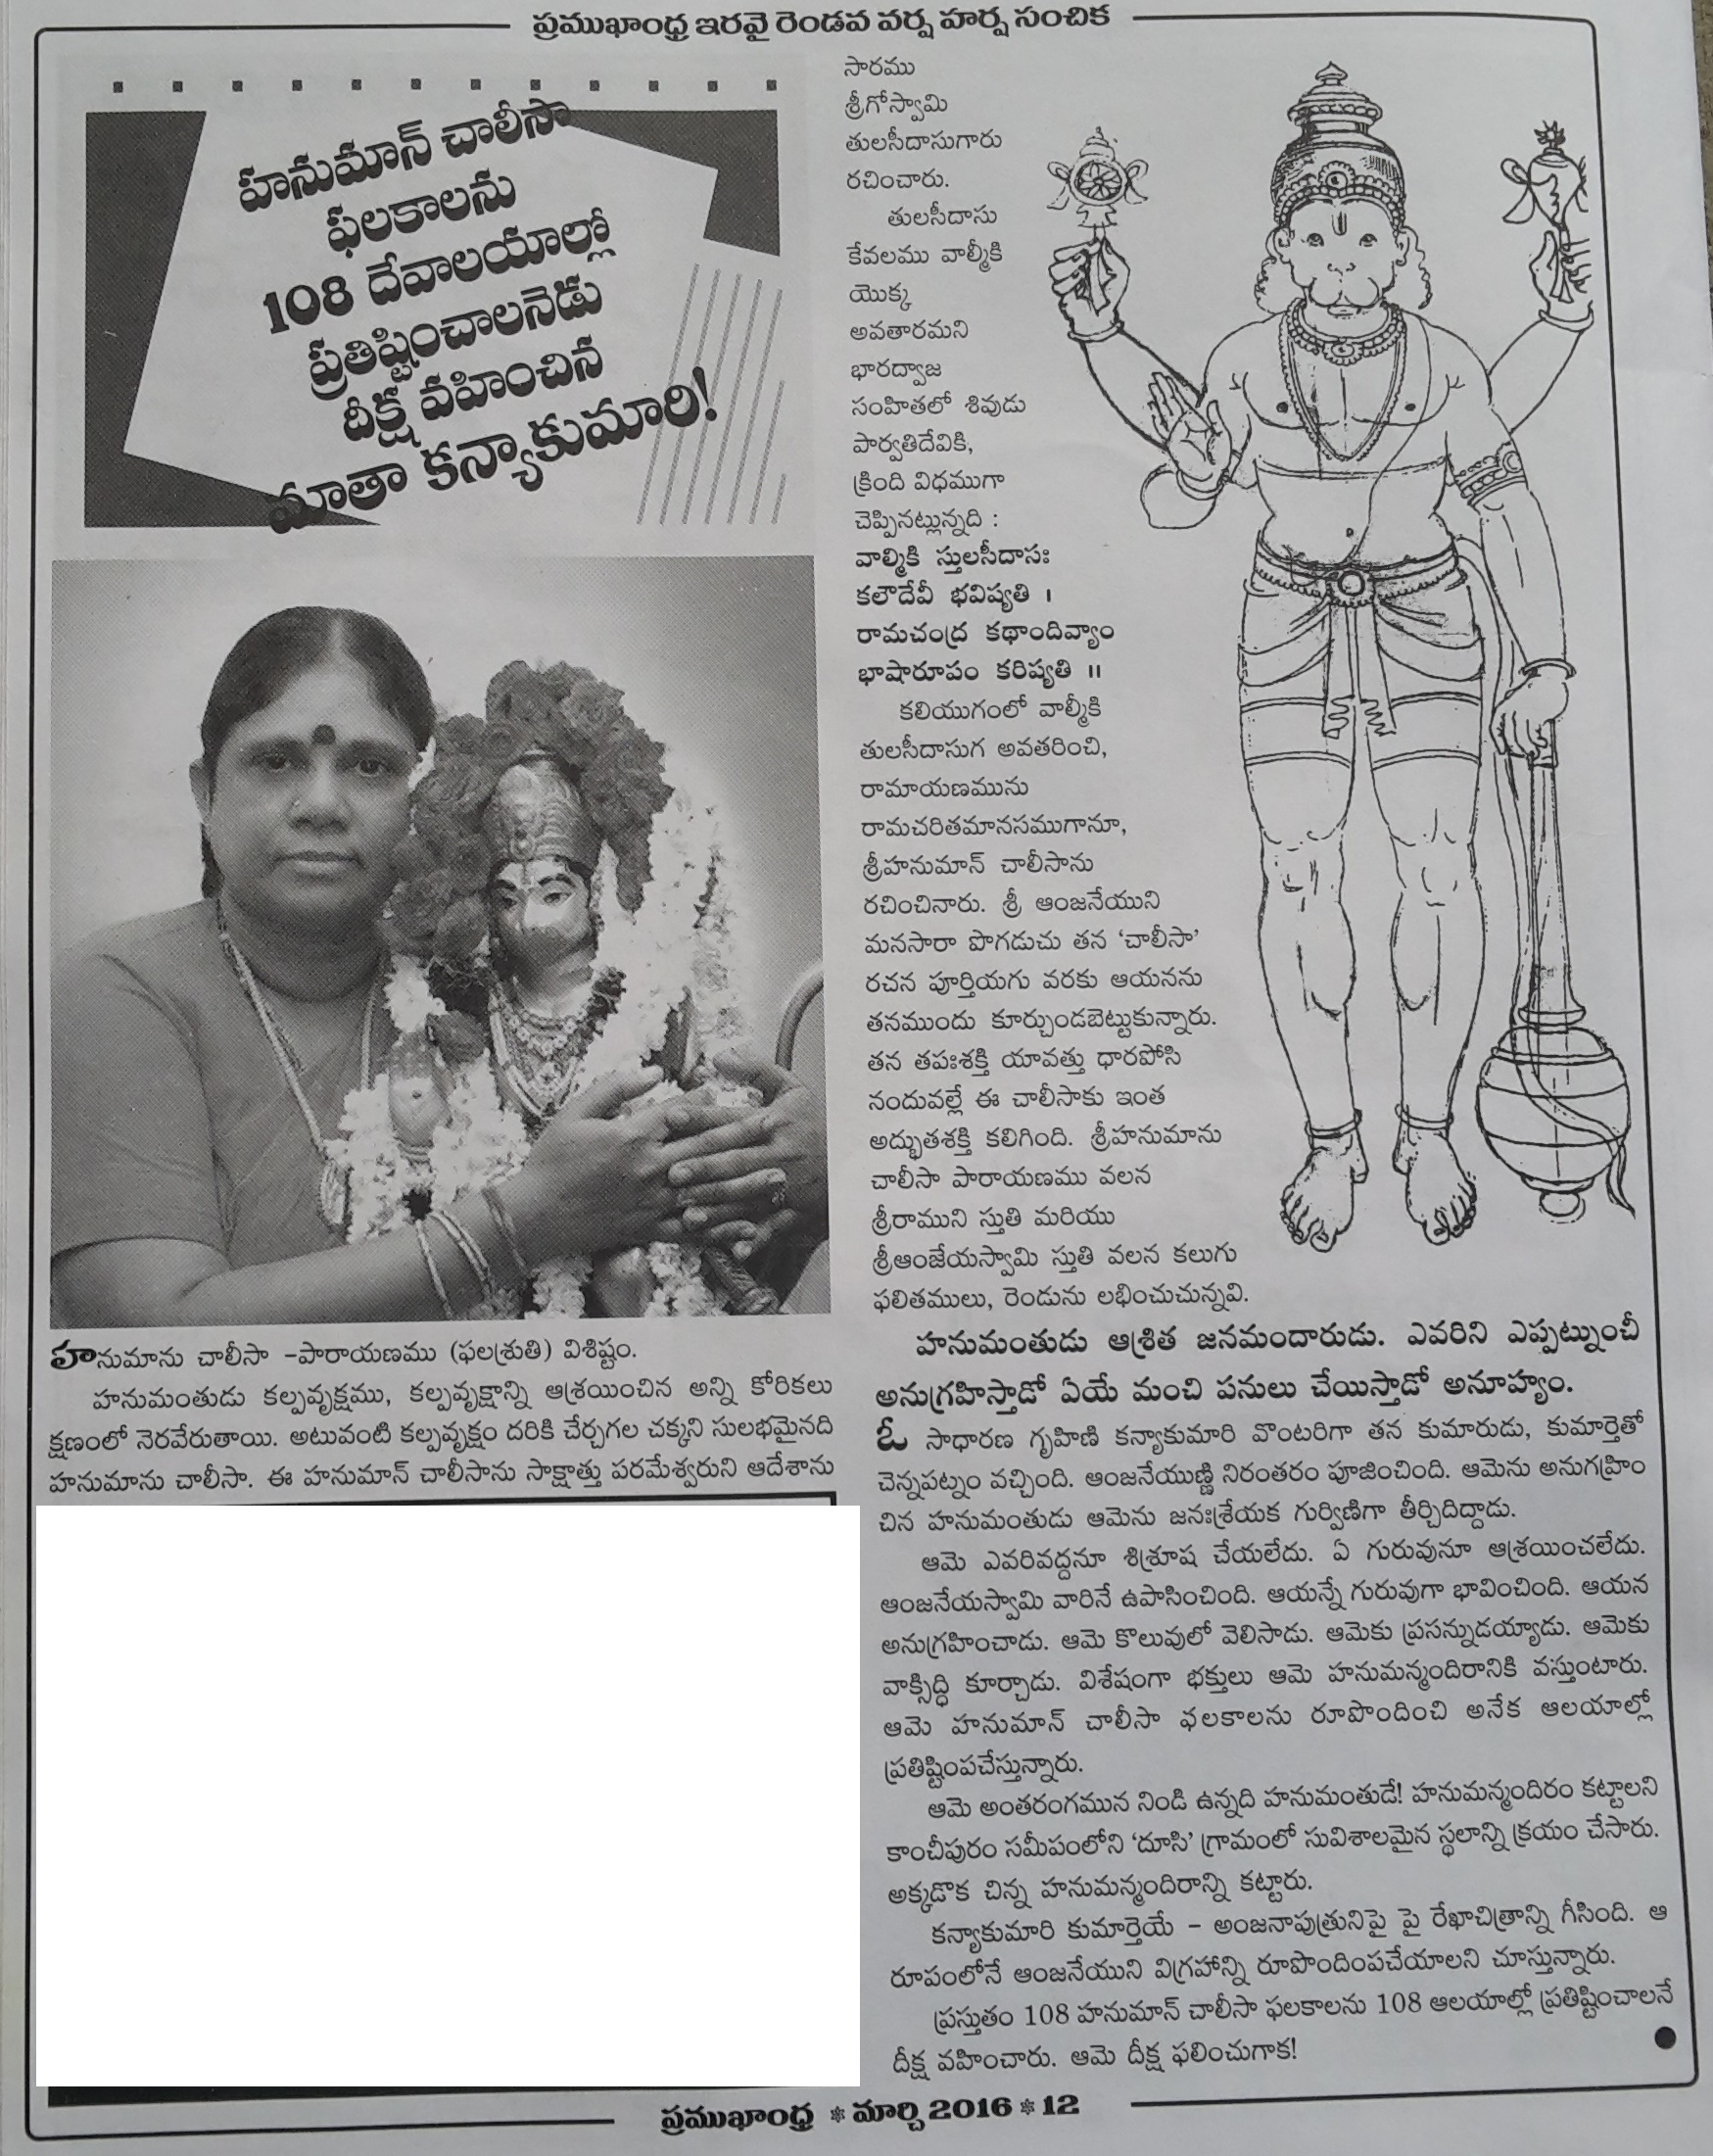 Pramukhandhra-(monthly-edition)- 12-3-2016